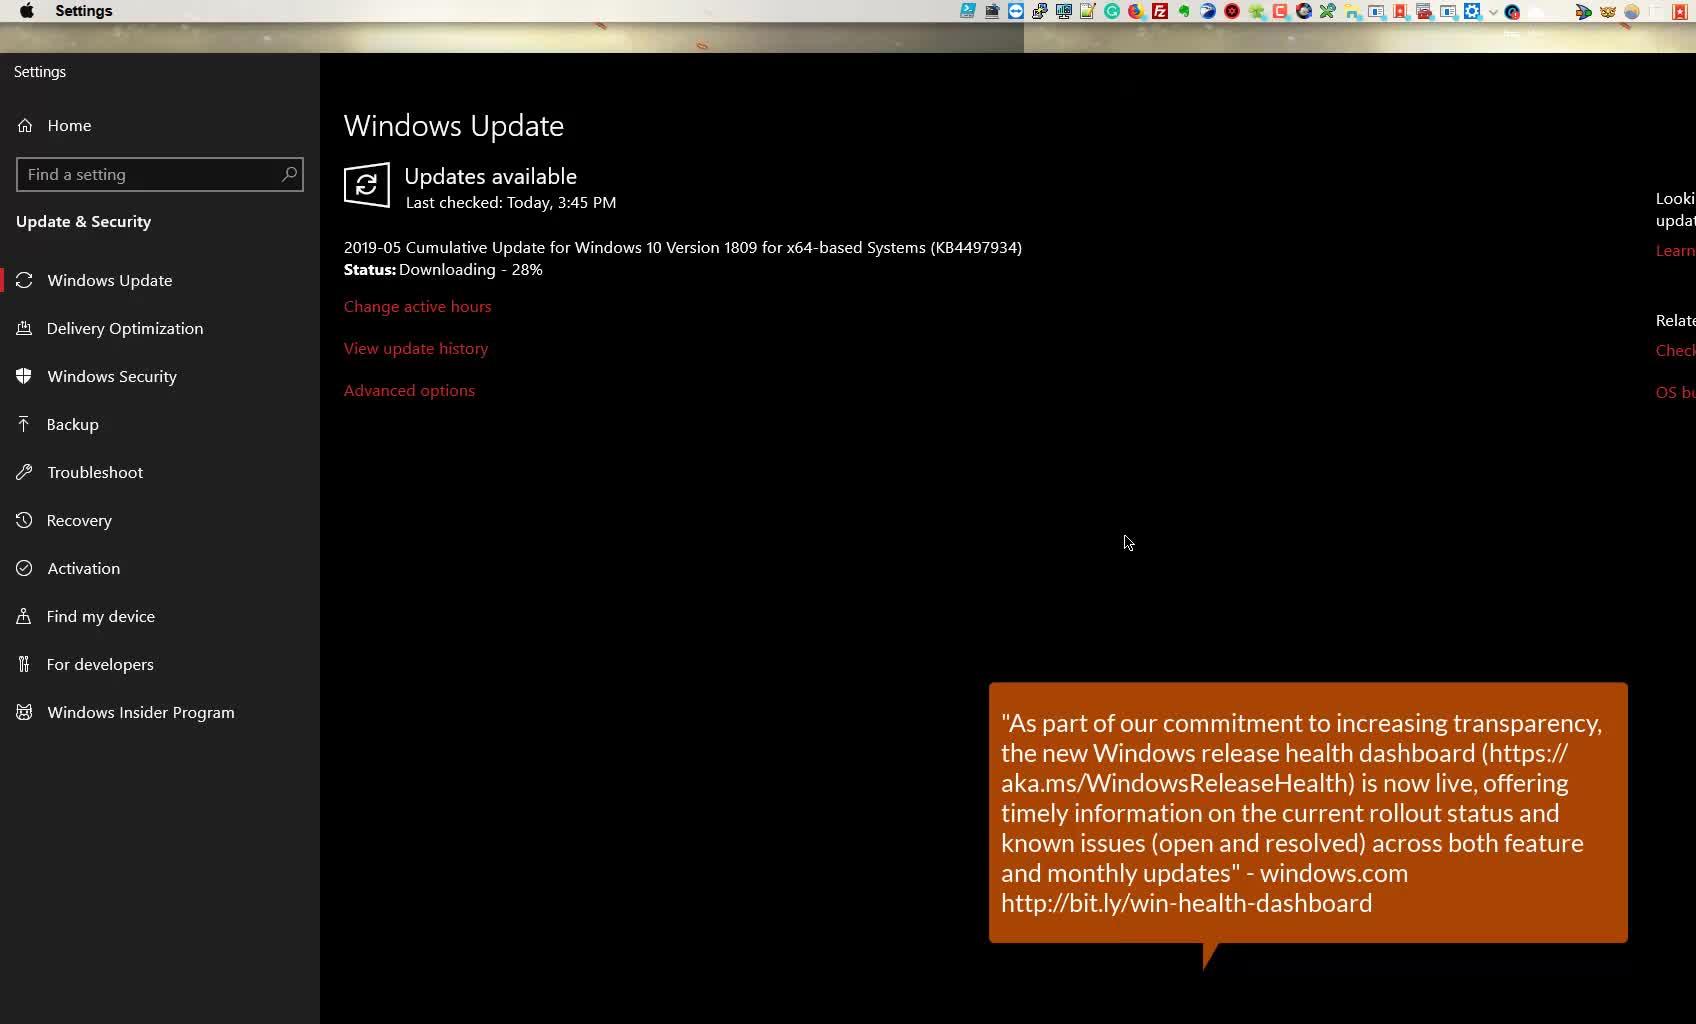 Windows 10 RTM 1903 build 18362 Upgrade or Switch to LTSC Pro Education Workstations KB4497934 | Windows 10 Server 2019